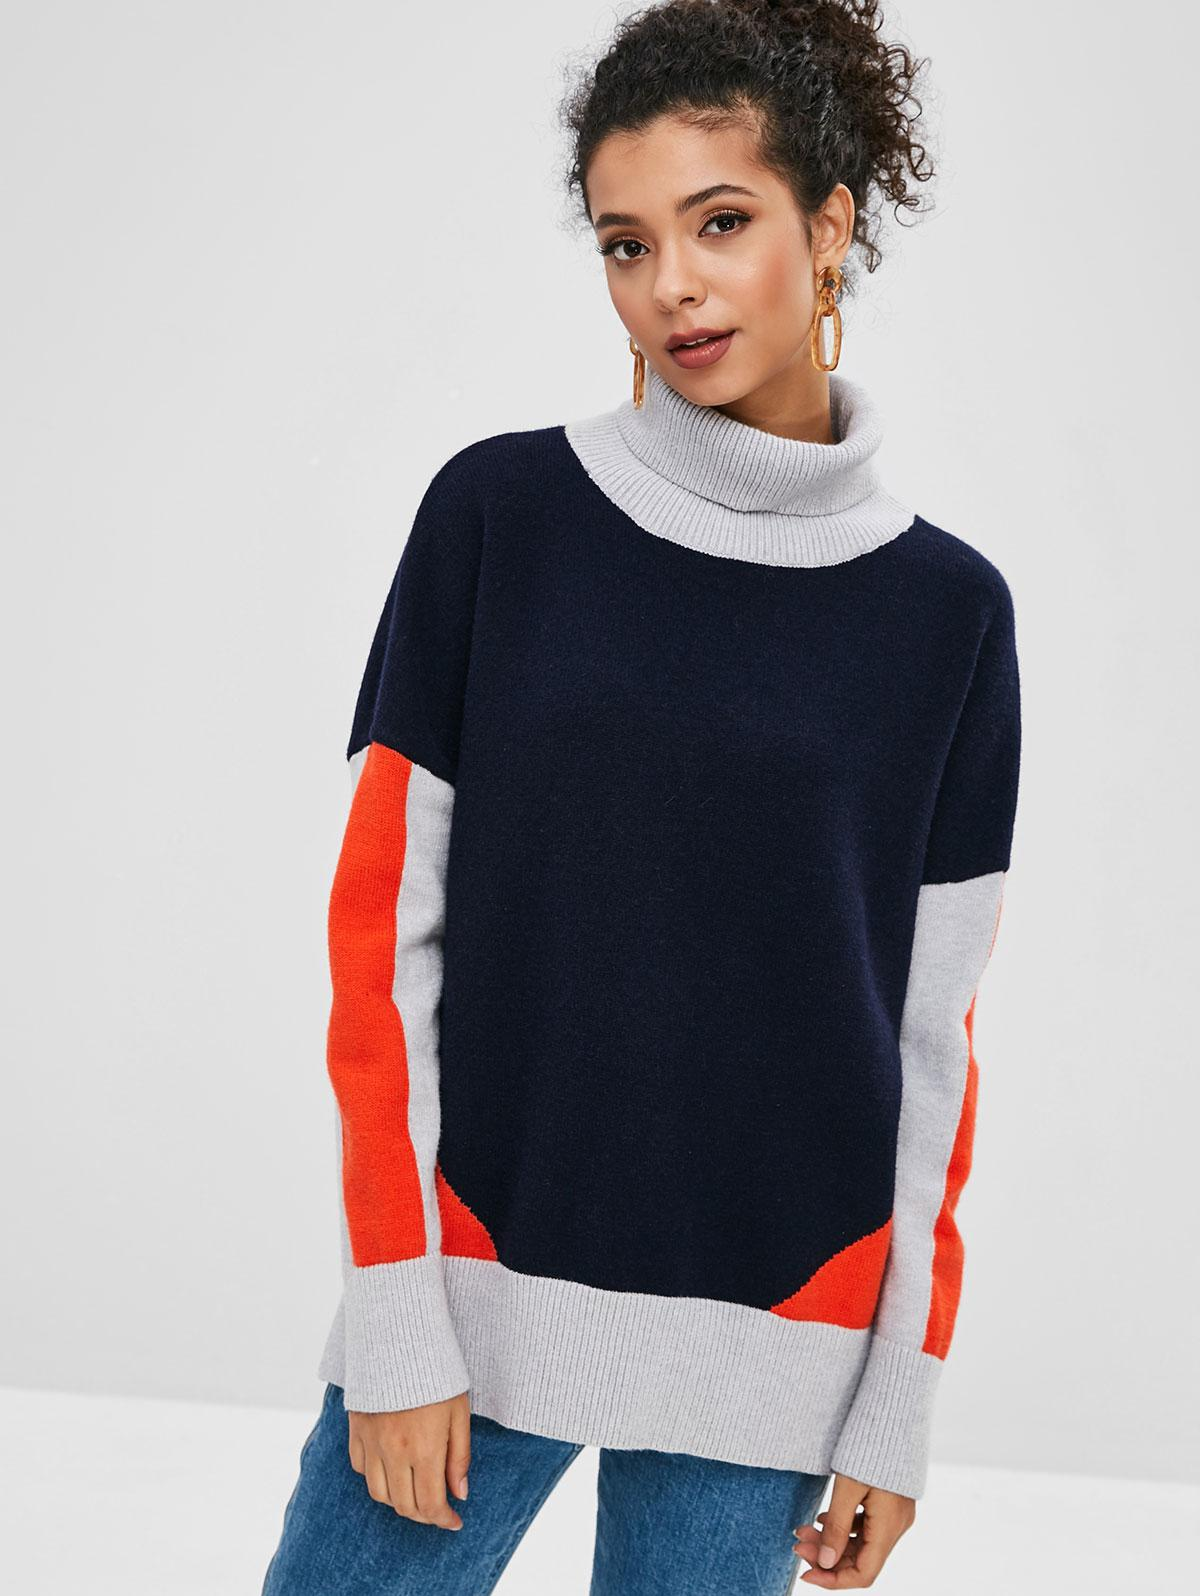 Slit Turtleneck Color Block Sweater